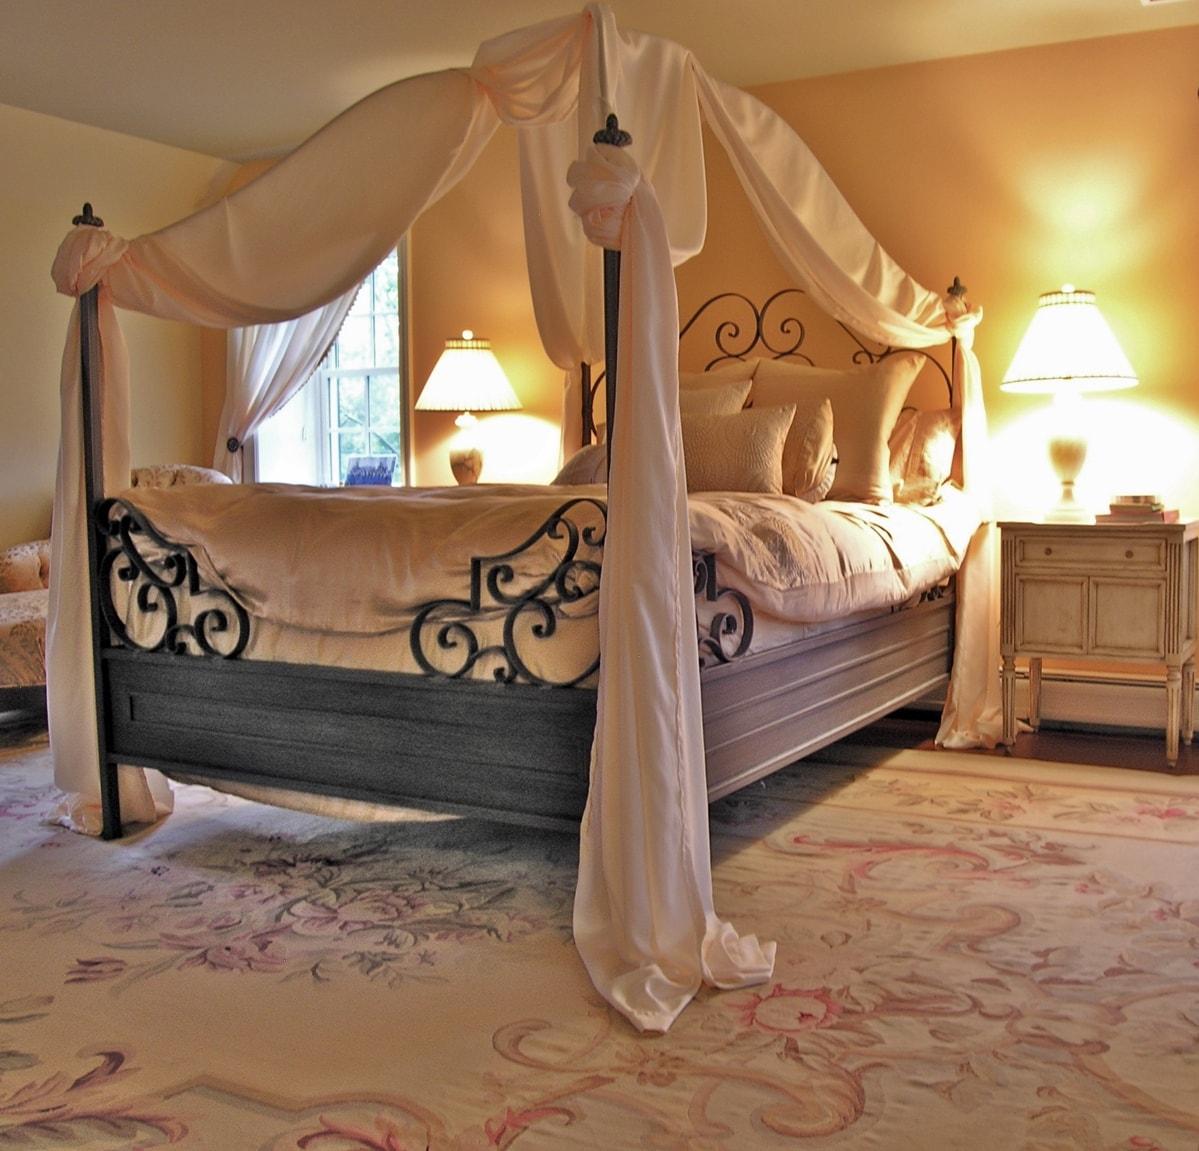 Интерьер спальной комнаты в стиле романтизм